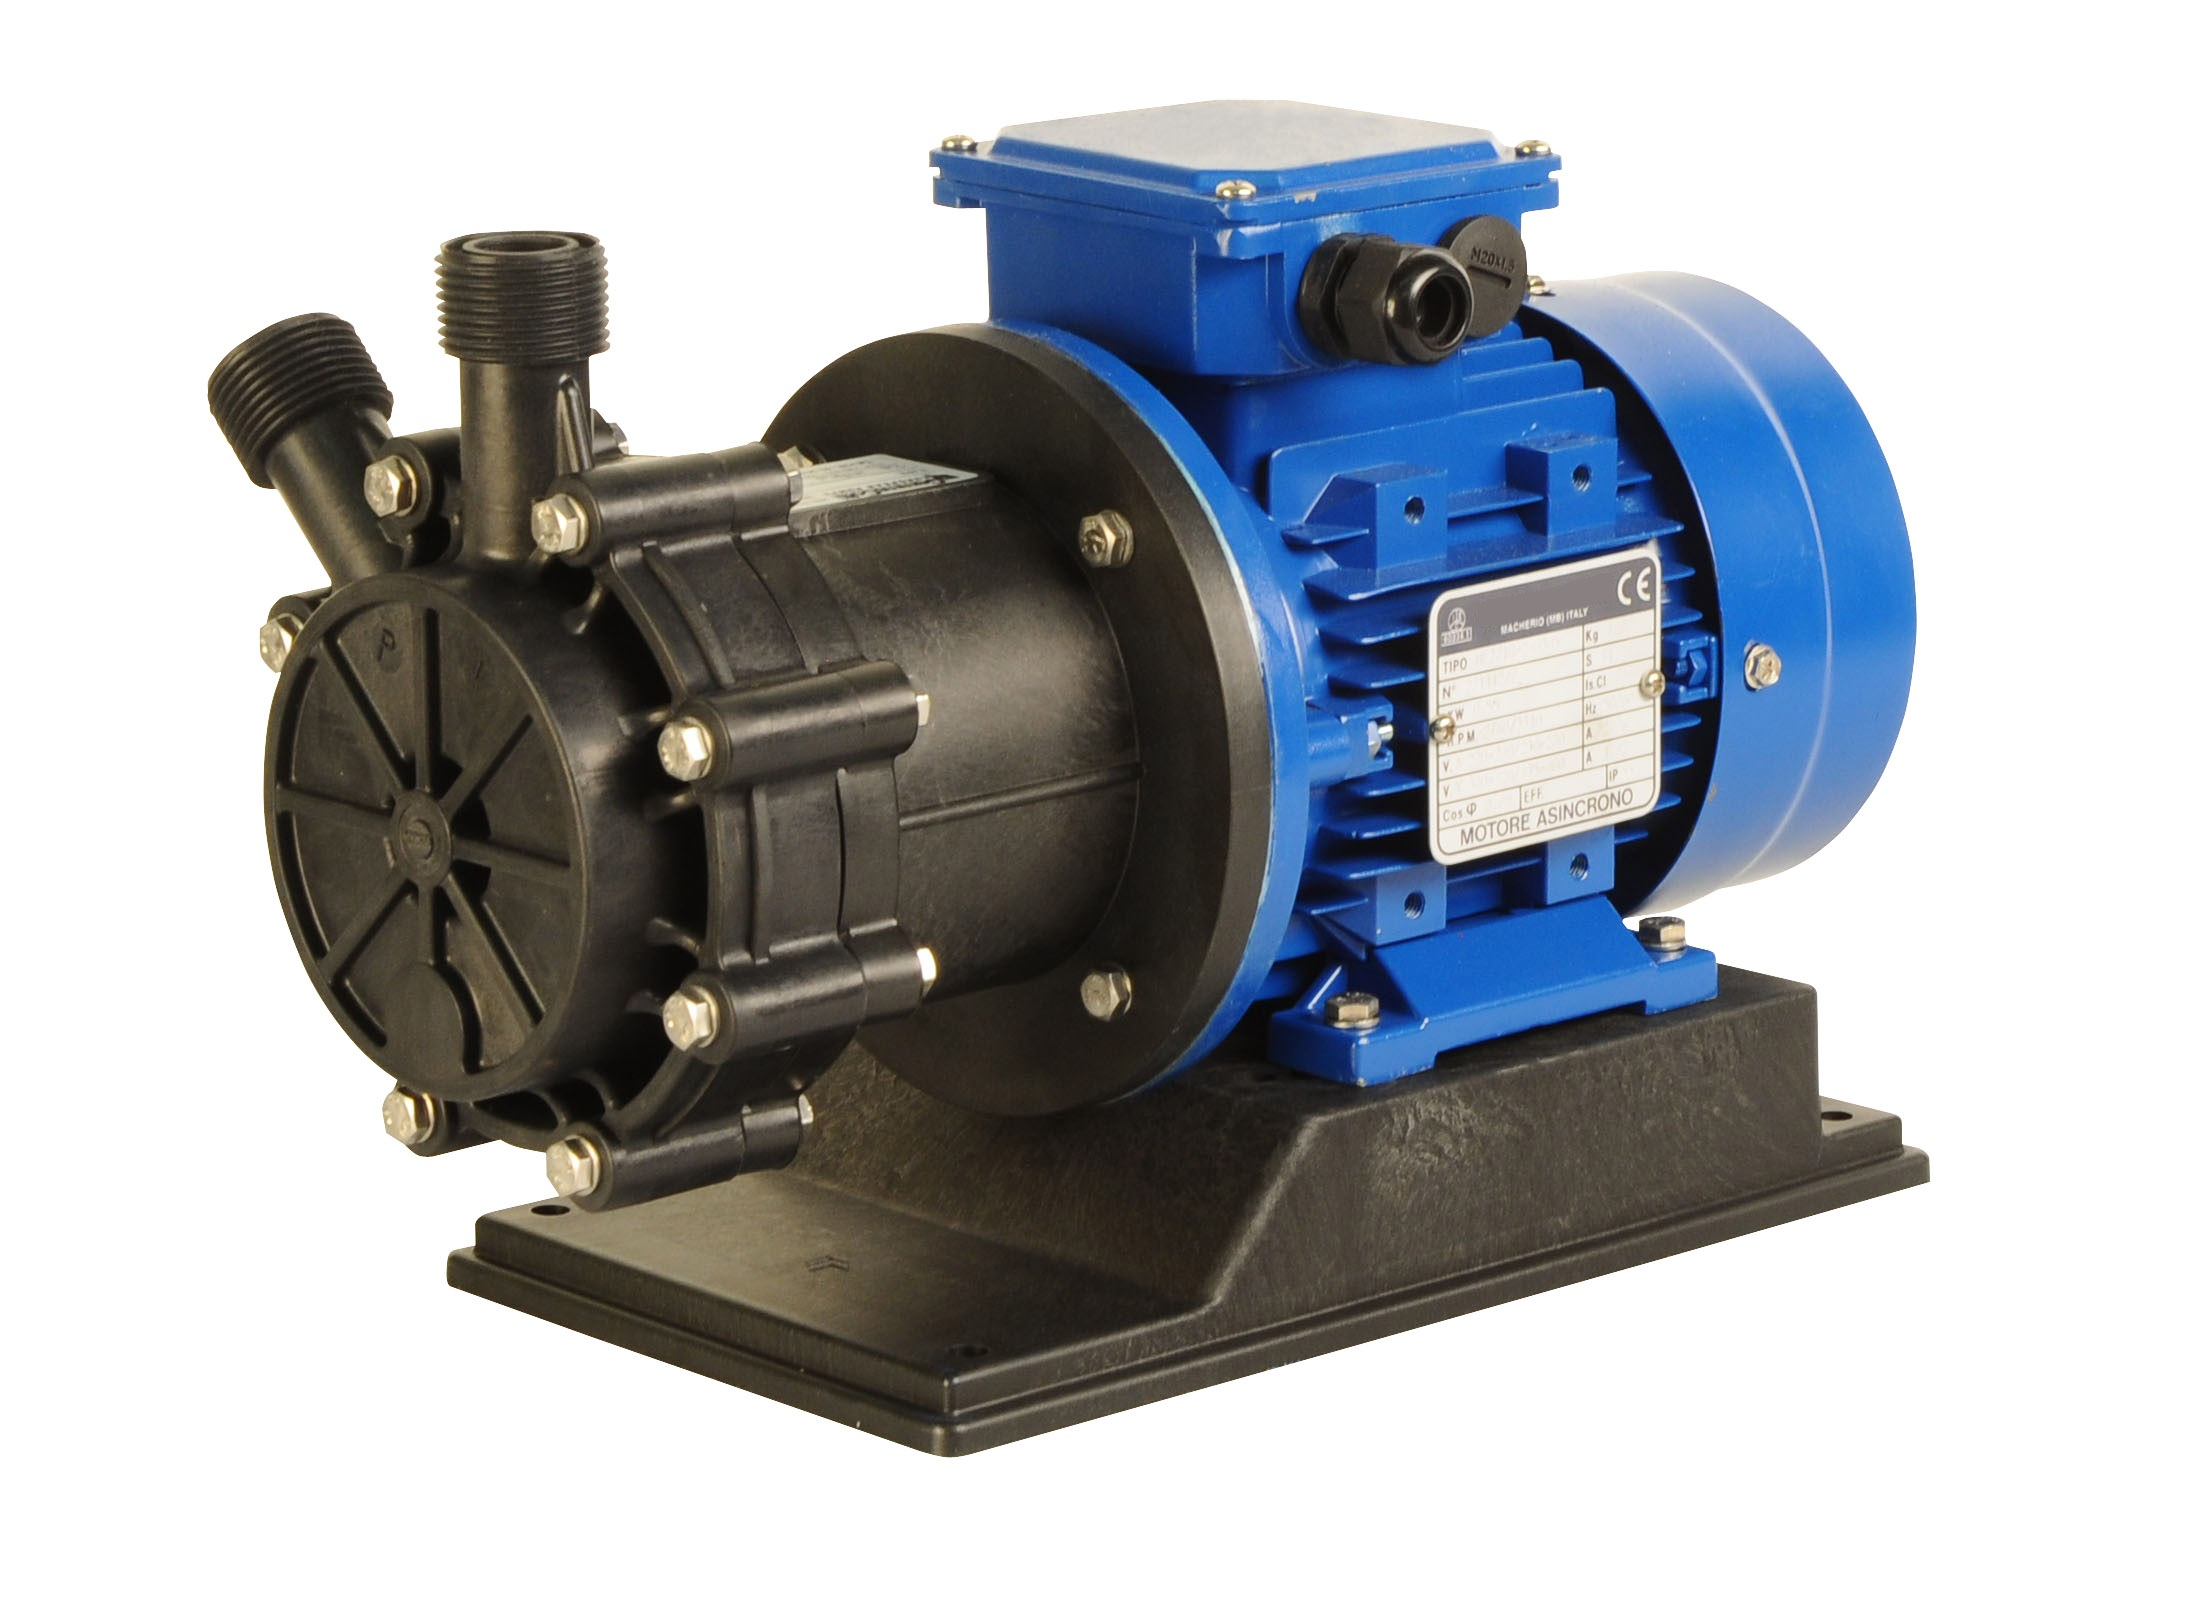 Magnetically Driven Regenerative Turbine Pump